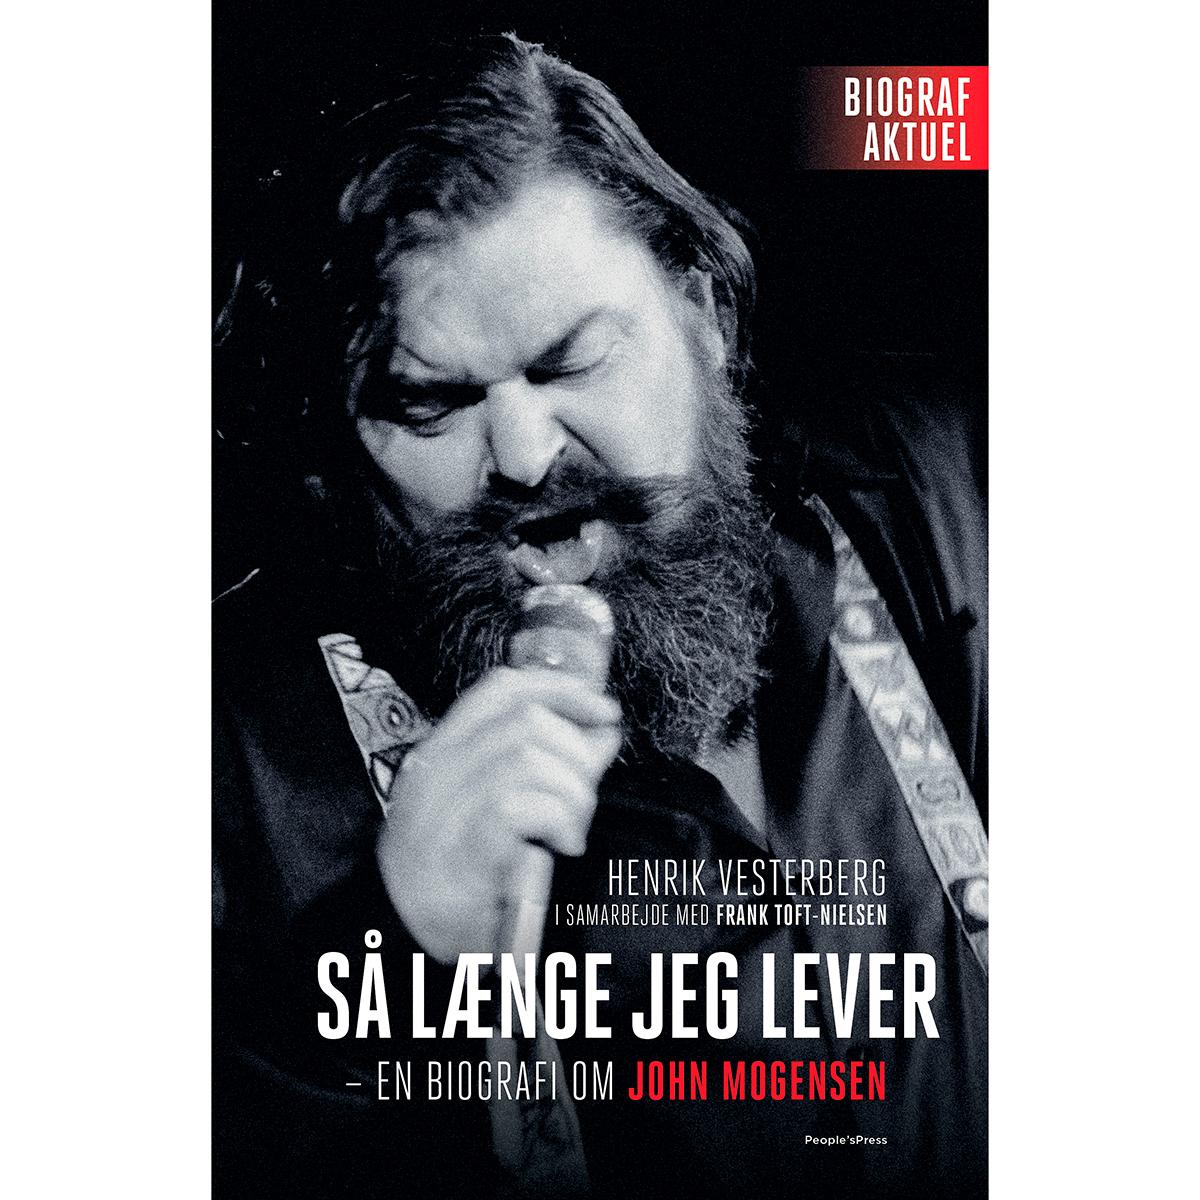 Så længe jeg lever - En biografi om John Mogensen - Hardback